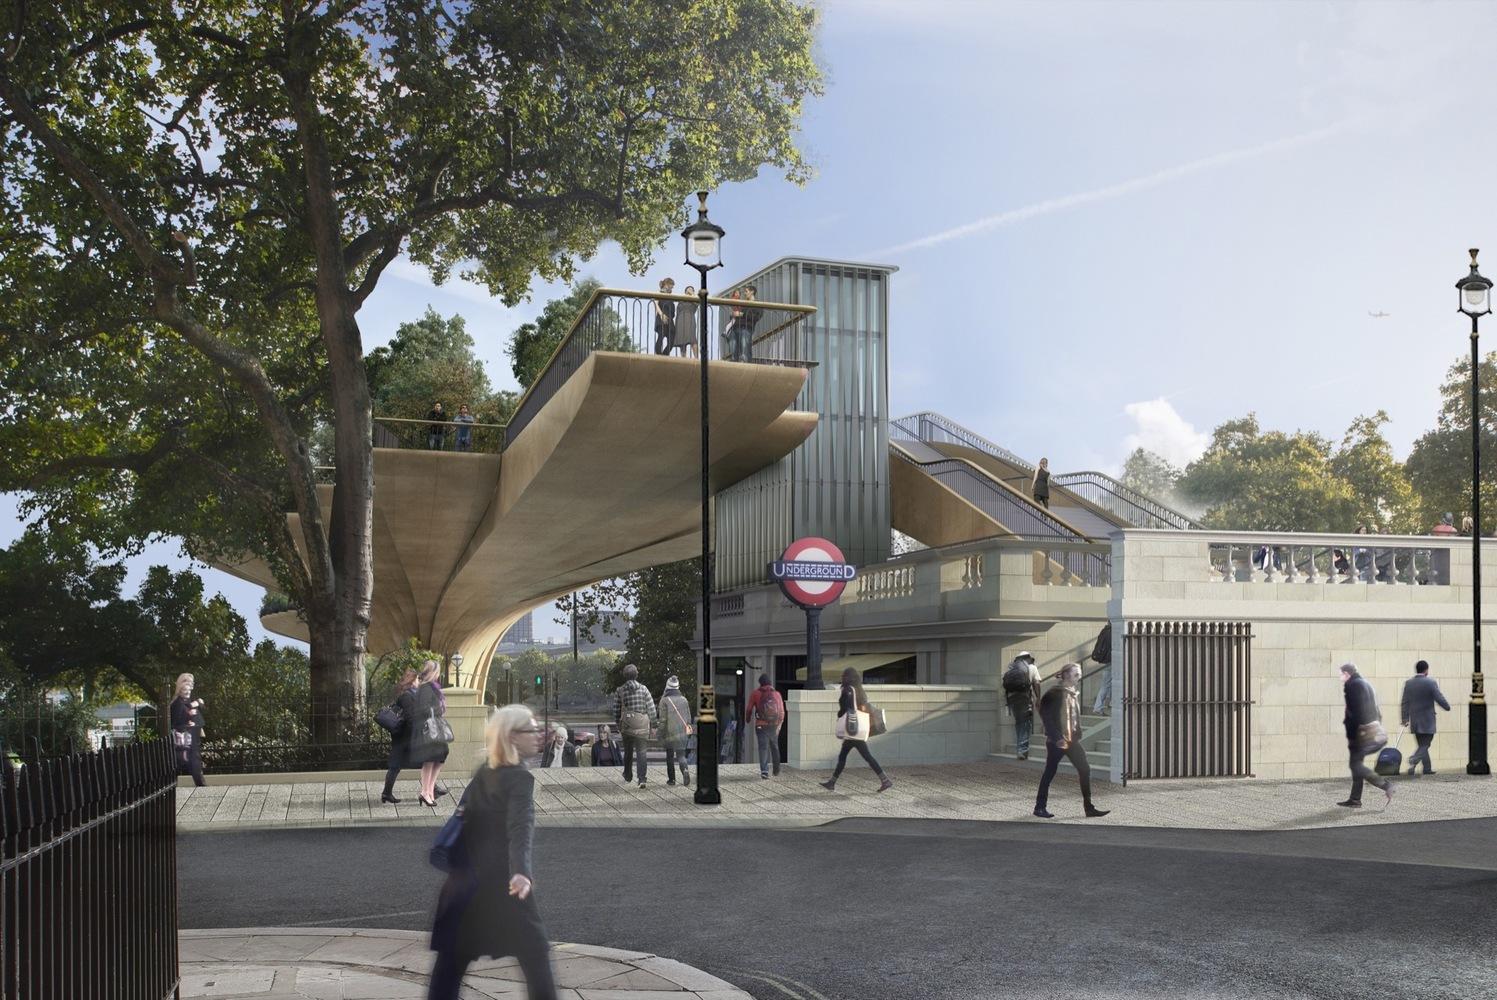 Gallery of London's Garden Bridge Project Should be Scrapped